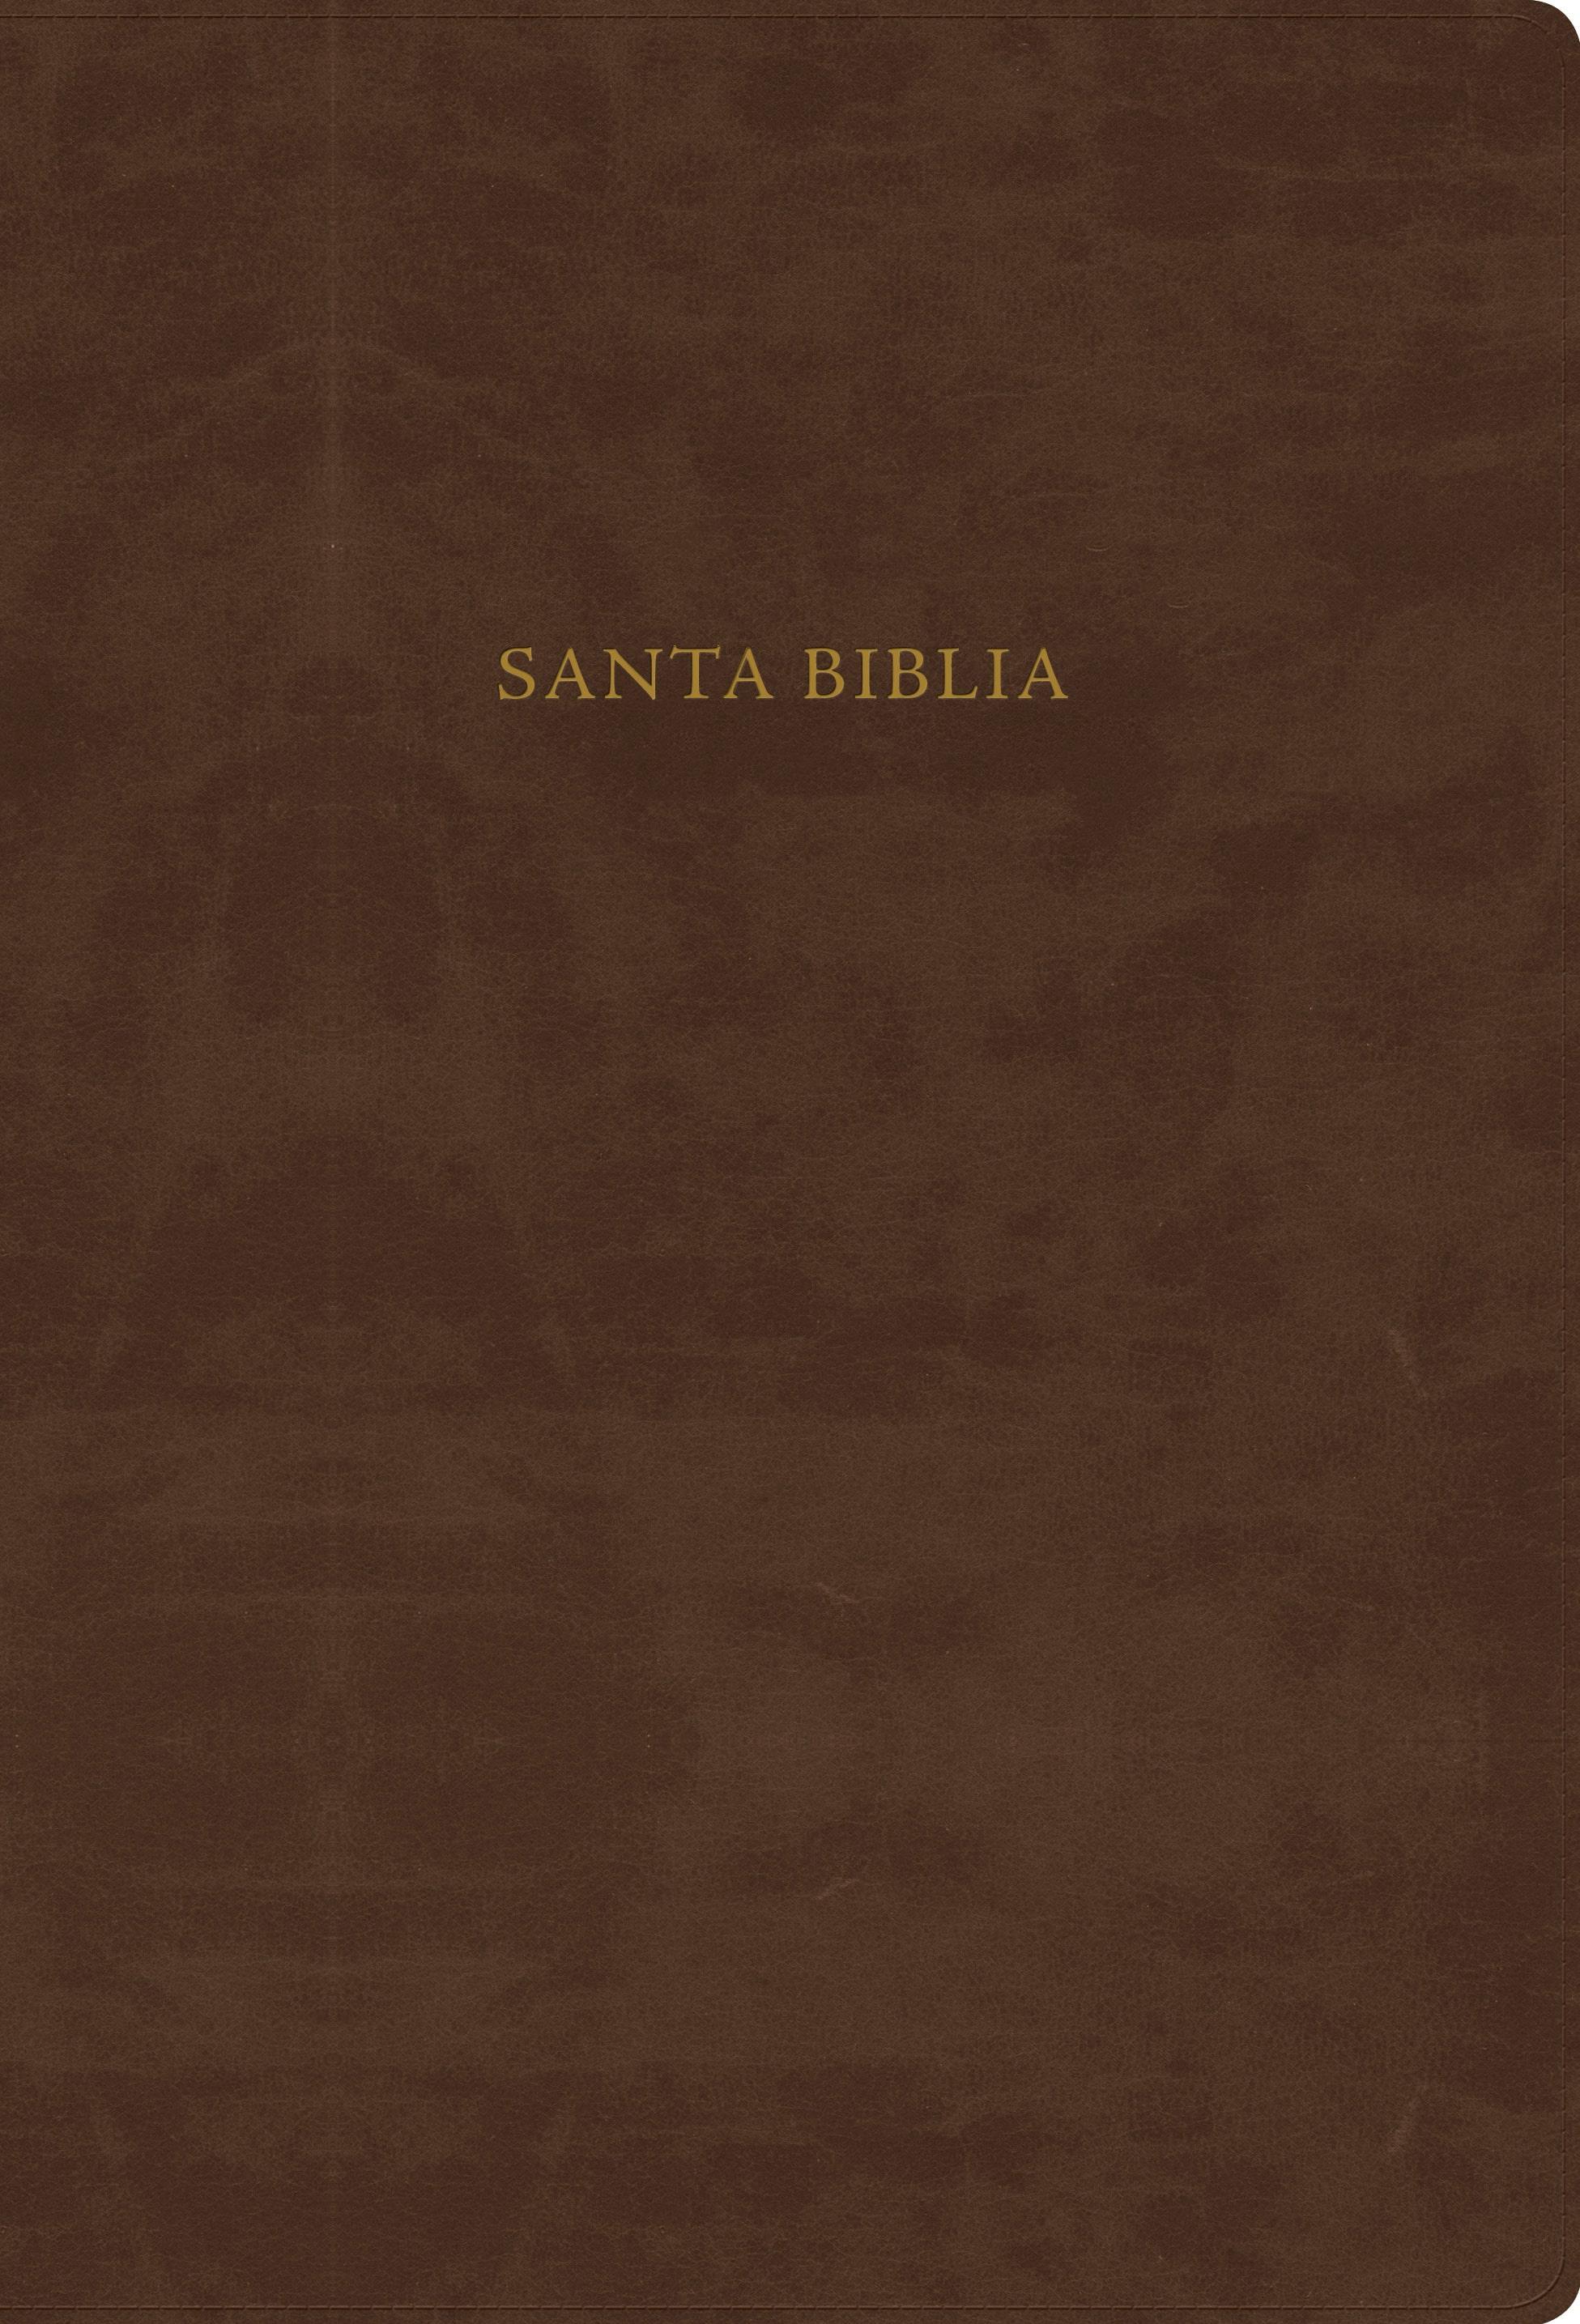 Biblia Scofield